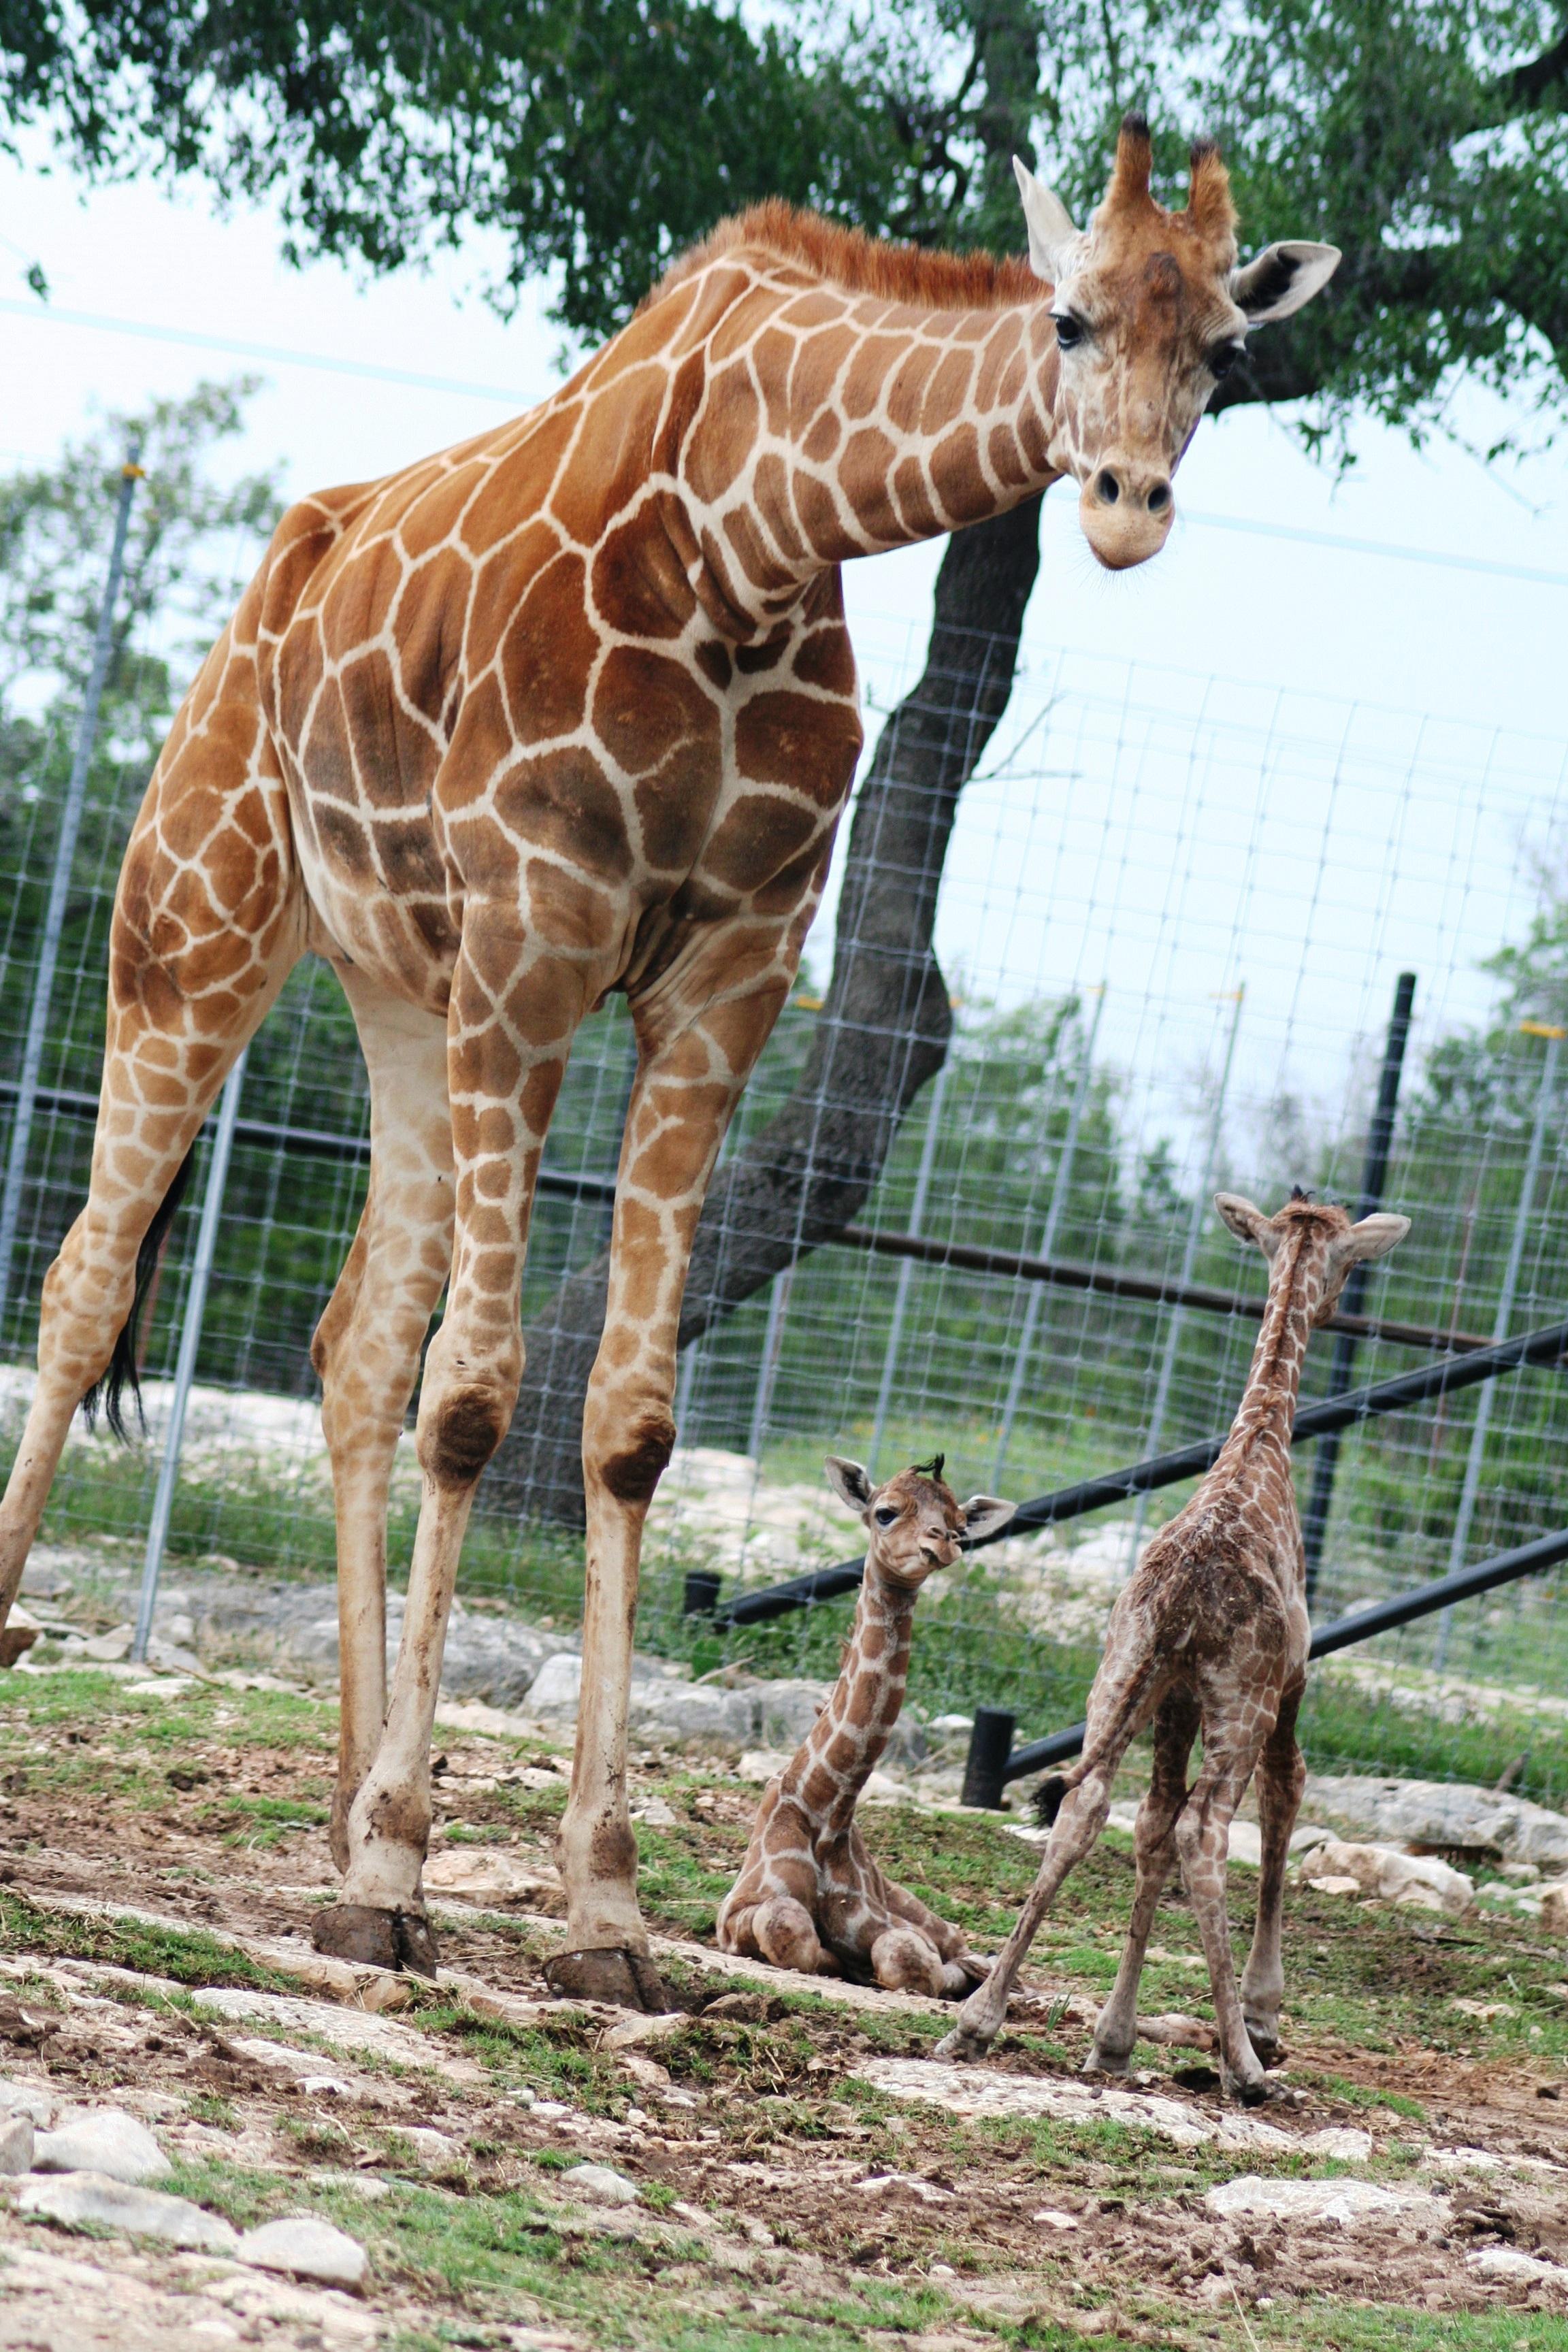 Twin_giraffes_born_at_Natural_Bridge_Wildlife_Ranch